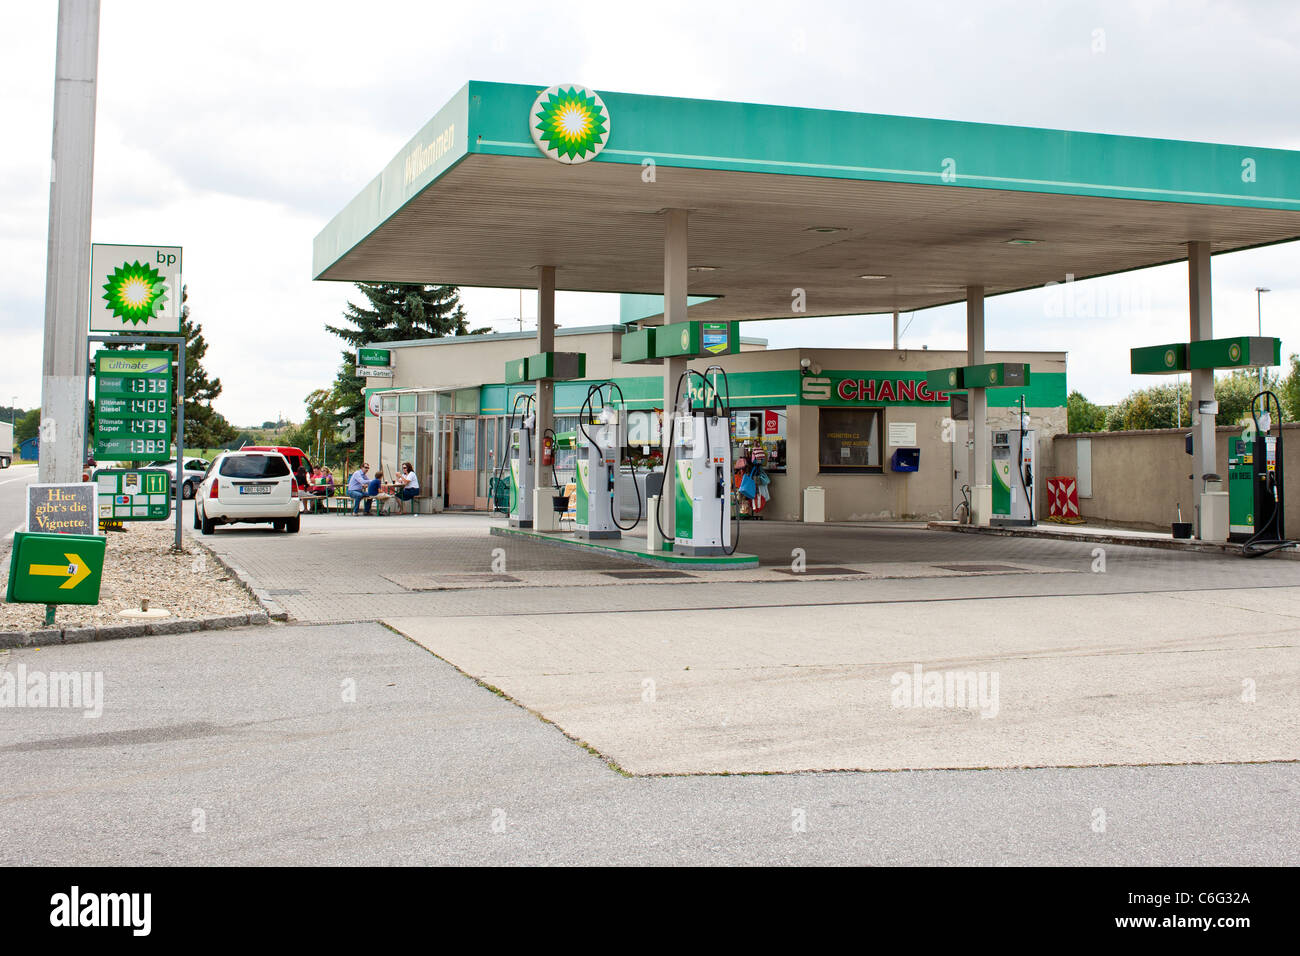 BP gas filling station Stock Photo: 38462322 - Alamy